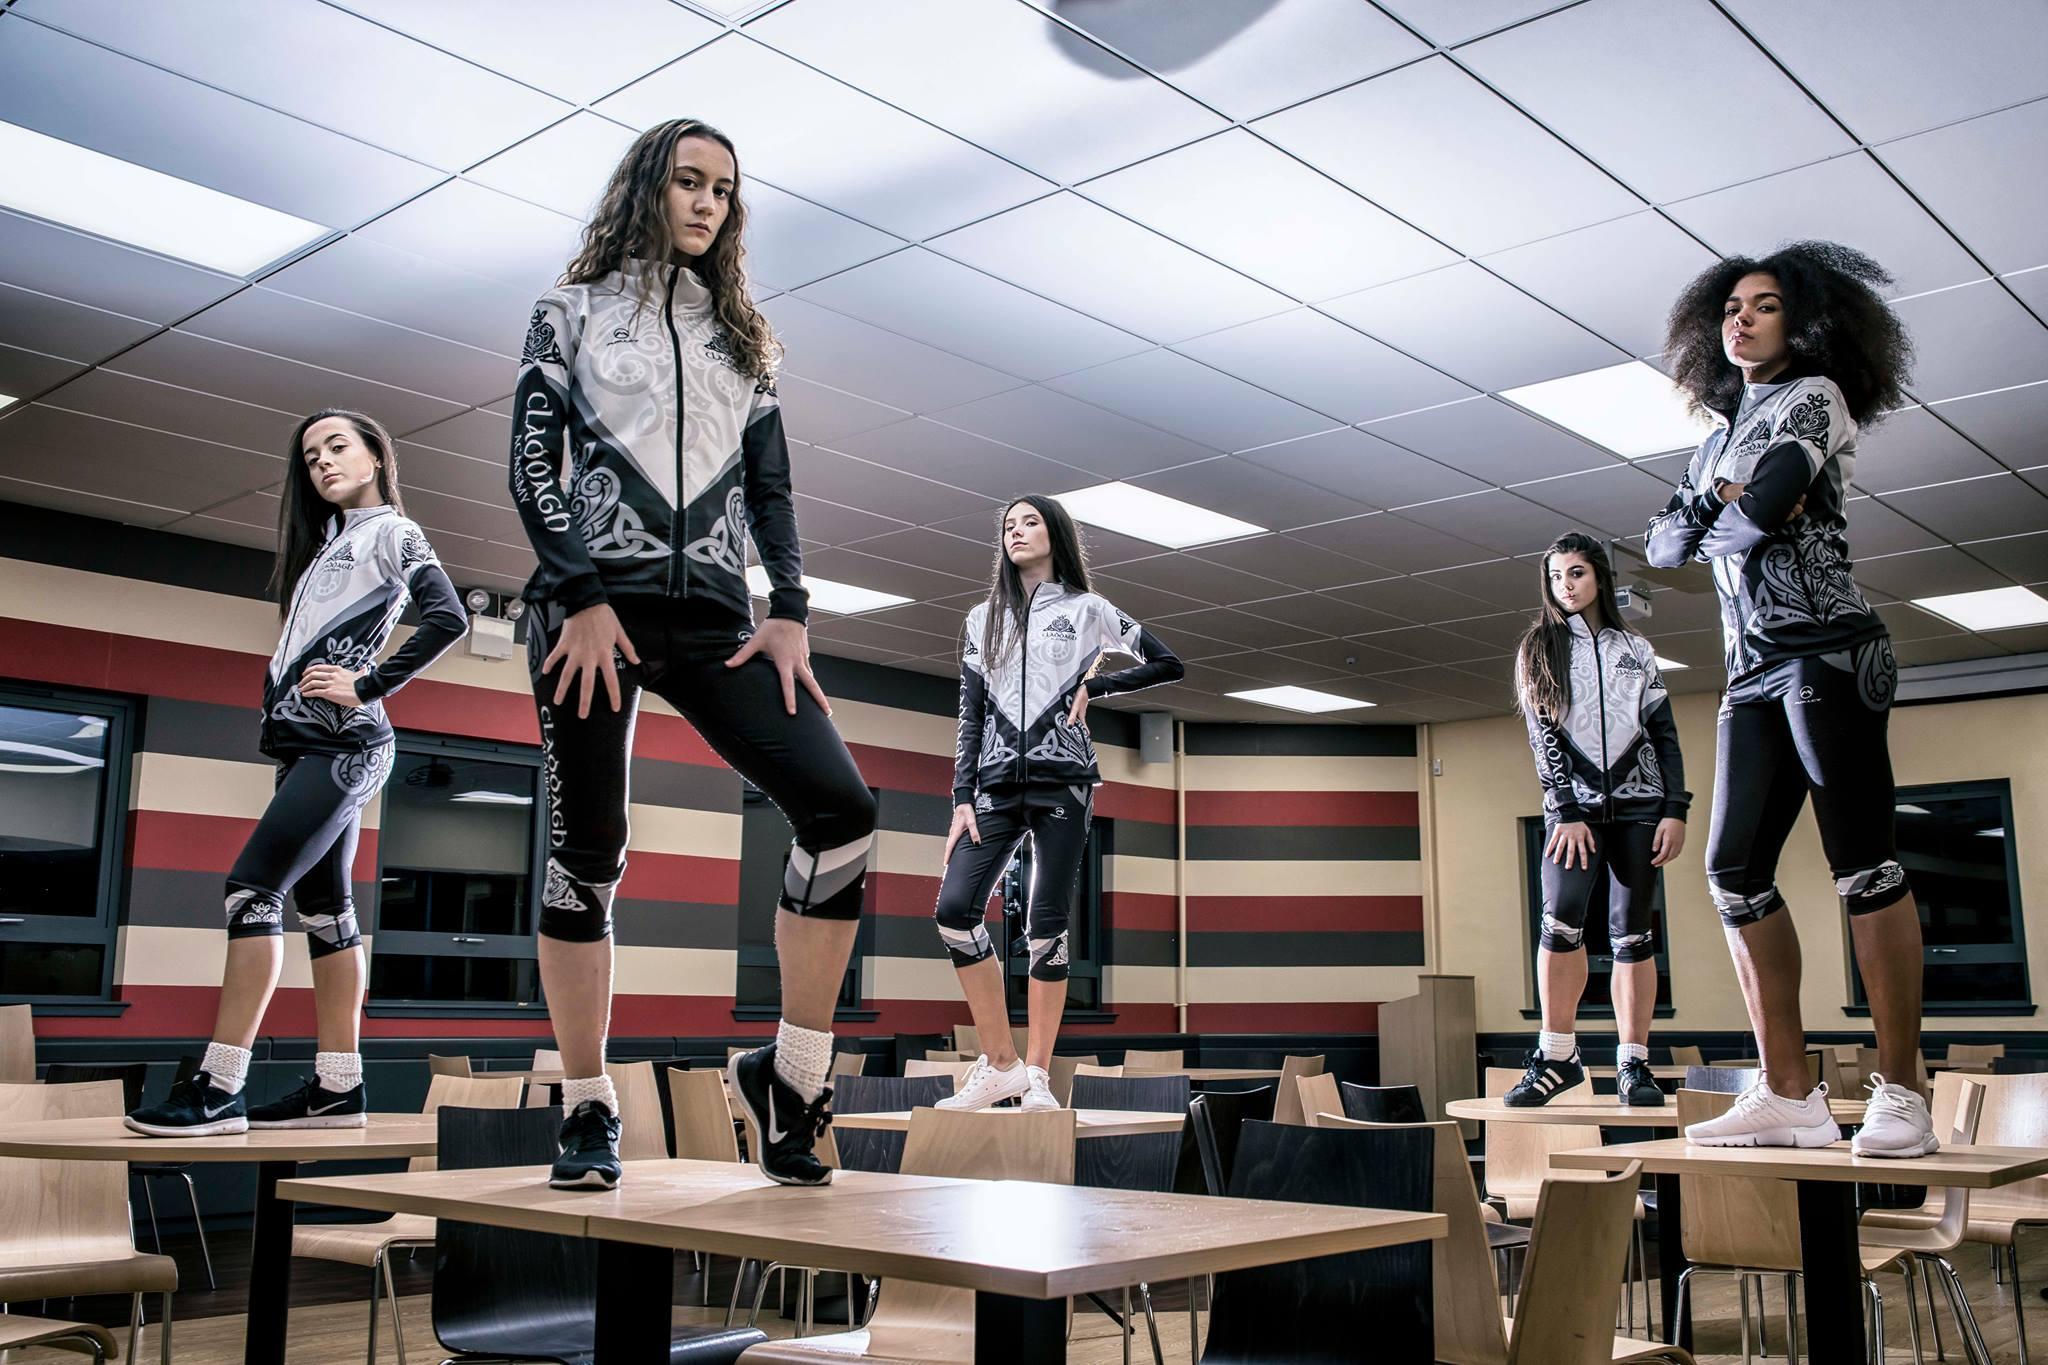 Claddagh Academy of Irish Dance, UK. Photo credit:   Grant Parfery Photography